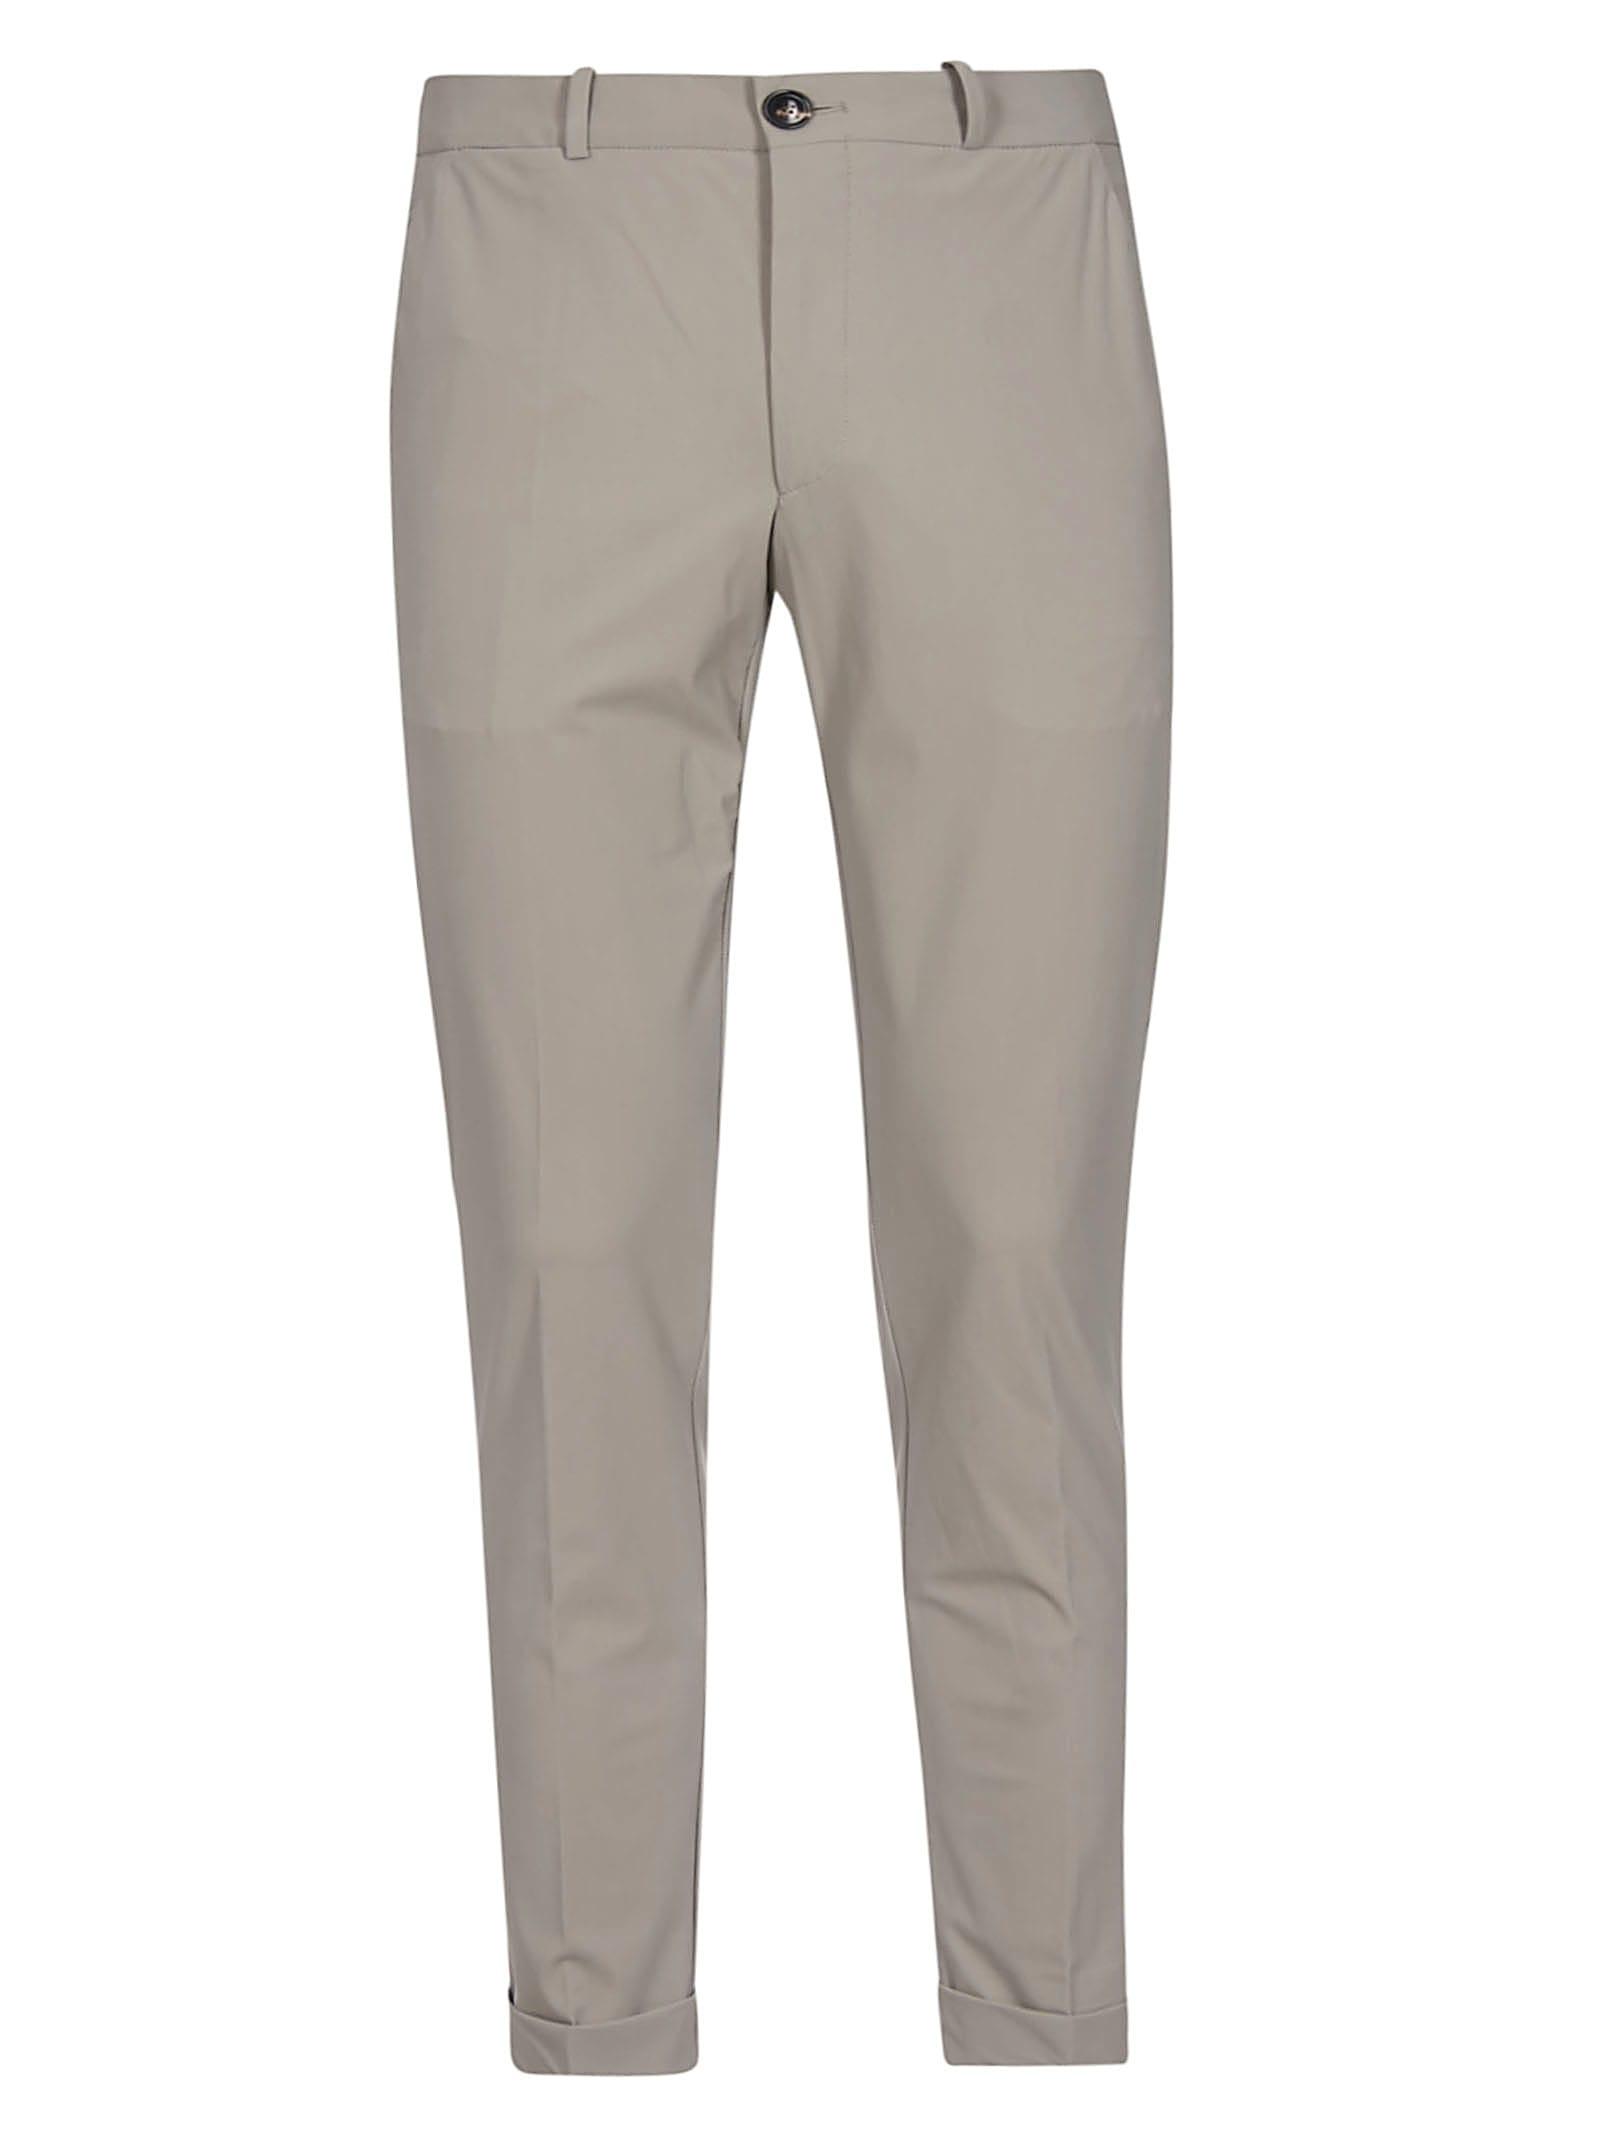 low priced c2ef8 fb5fd Best price on the market at italist | RRD - Roberto Ricci Design RRD -  Roberto Ricci Design Classic Trousers